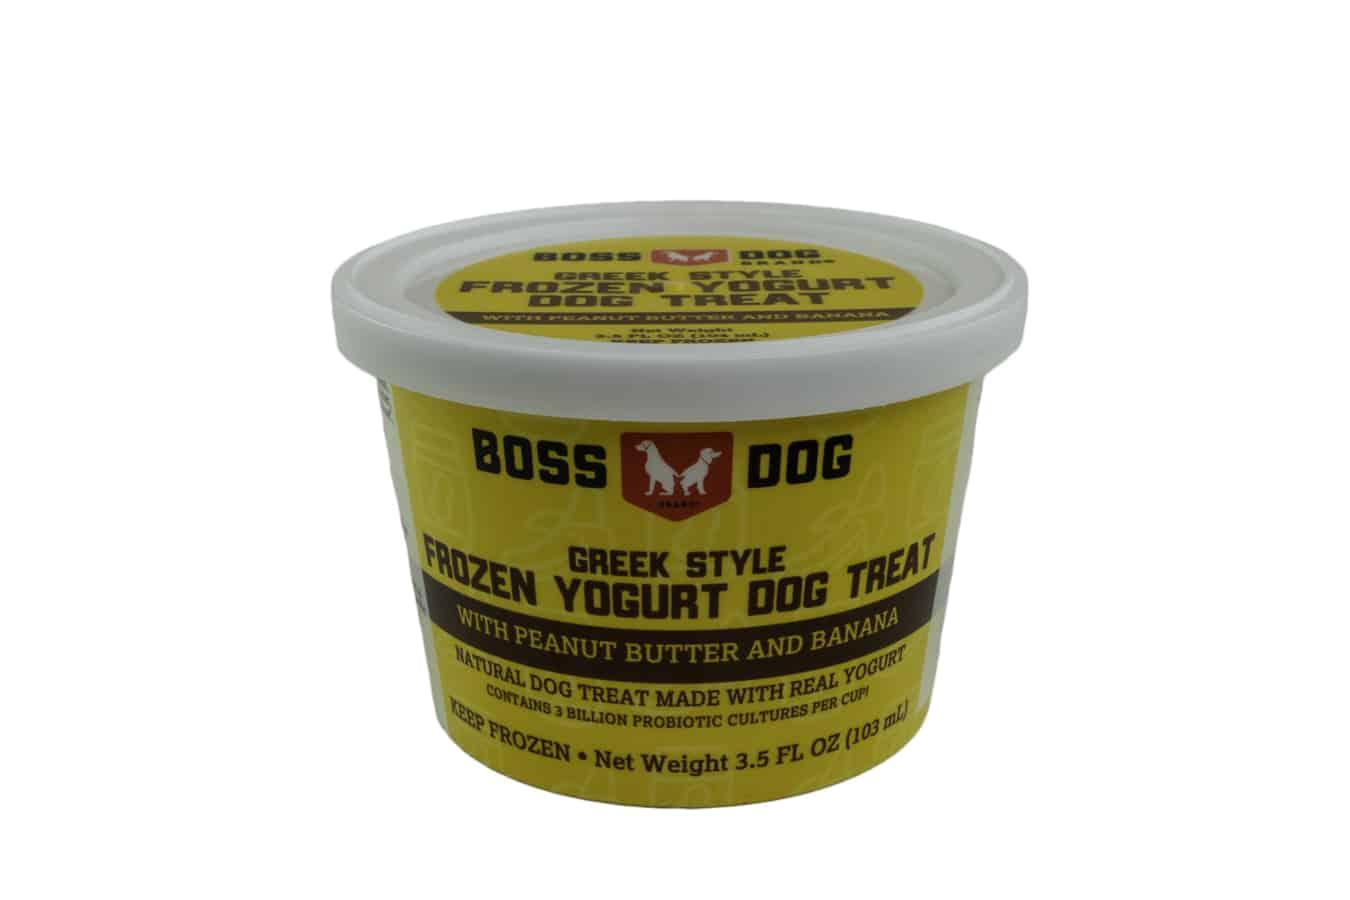 Boss Dog PB & Banana Frozen Yogurt Dog Treats, 3.5-oz, Single Cup Size: 3.5-oz, Single Cup